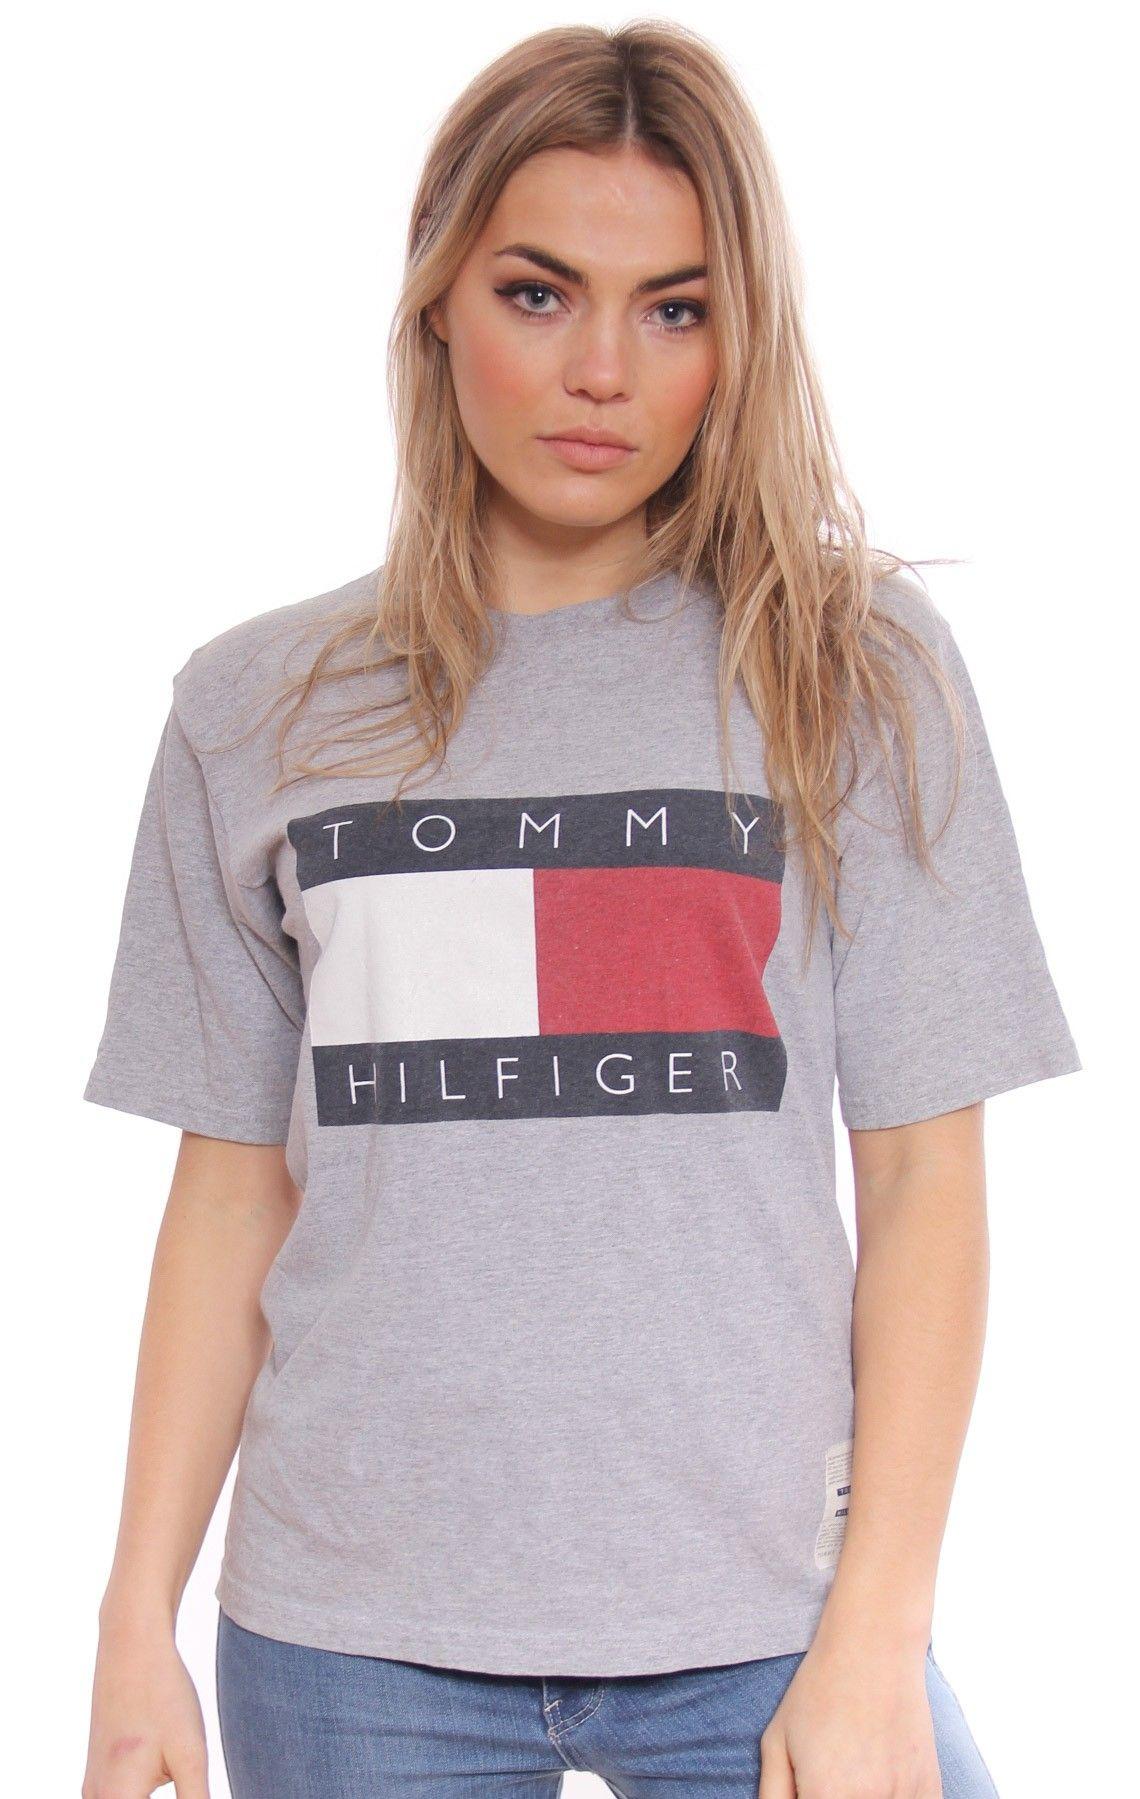 Vintage Tommy Hilfiger Box Logo Tee  b7479a7a16